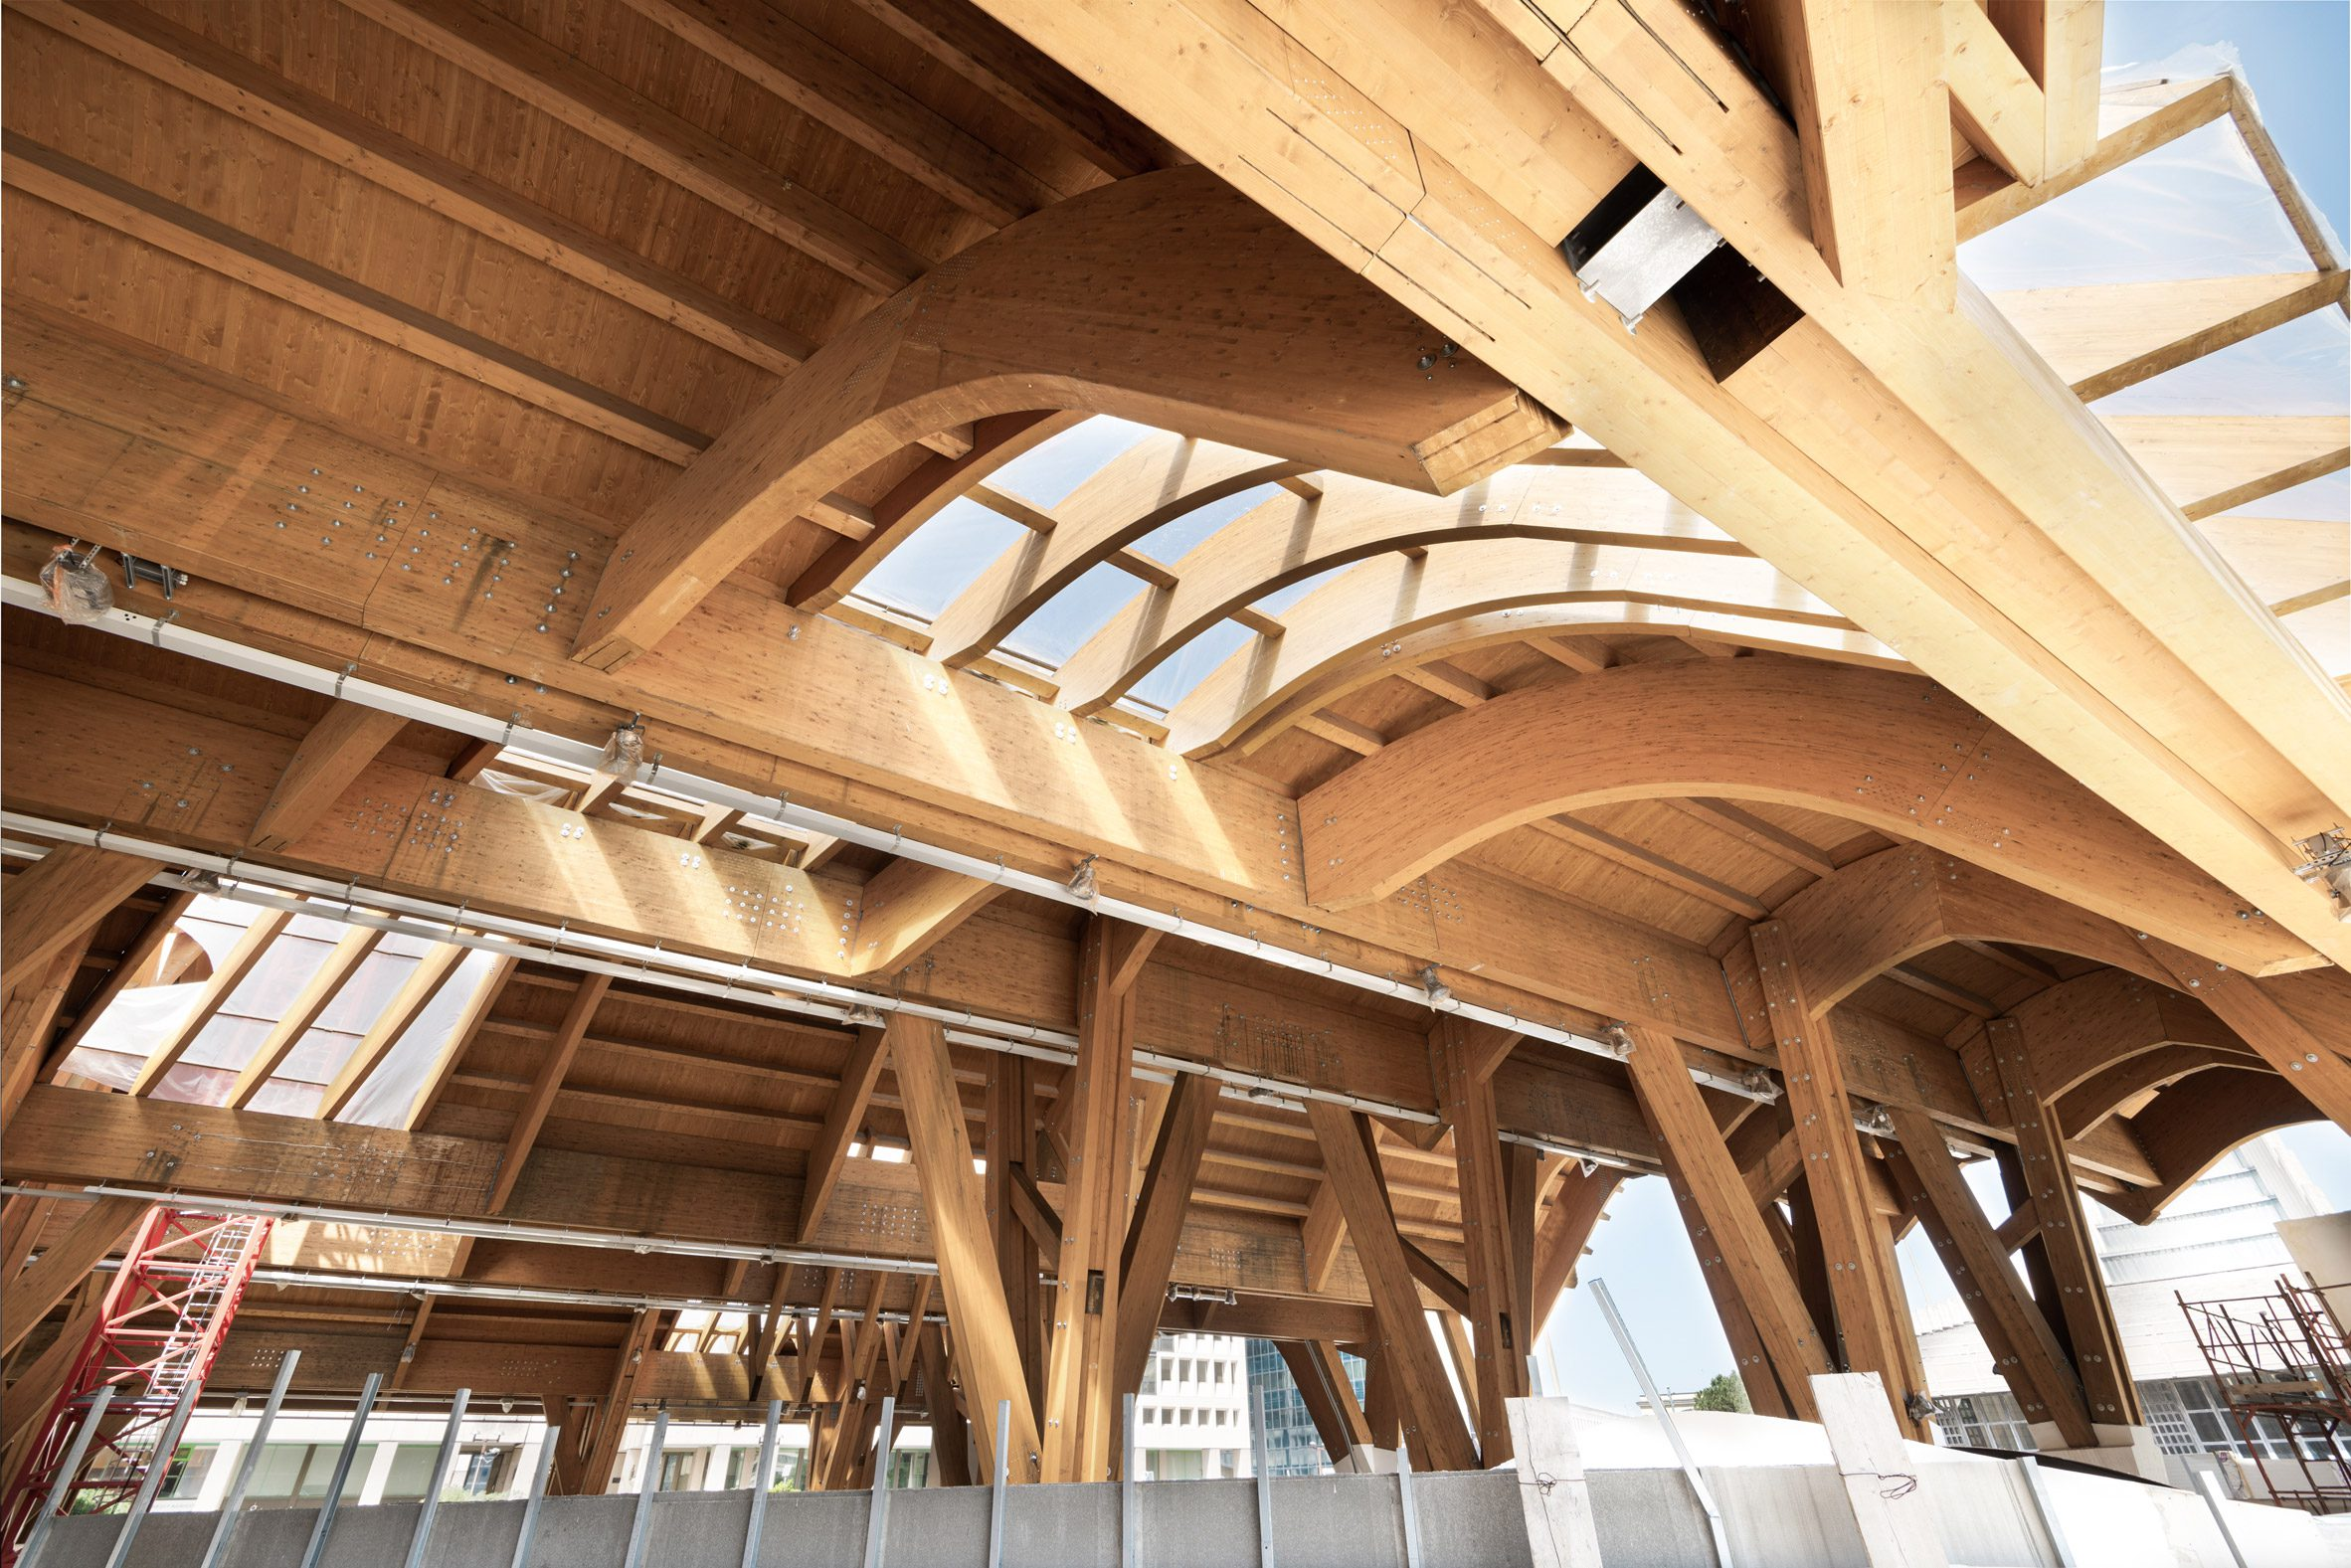 Arches in Italian underground station